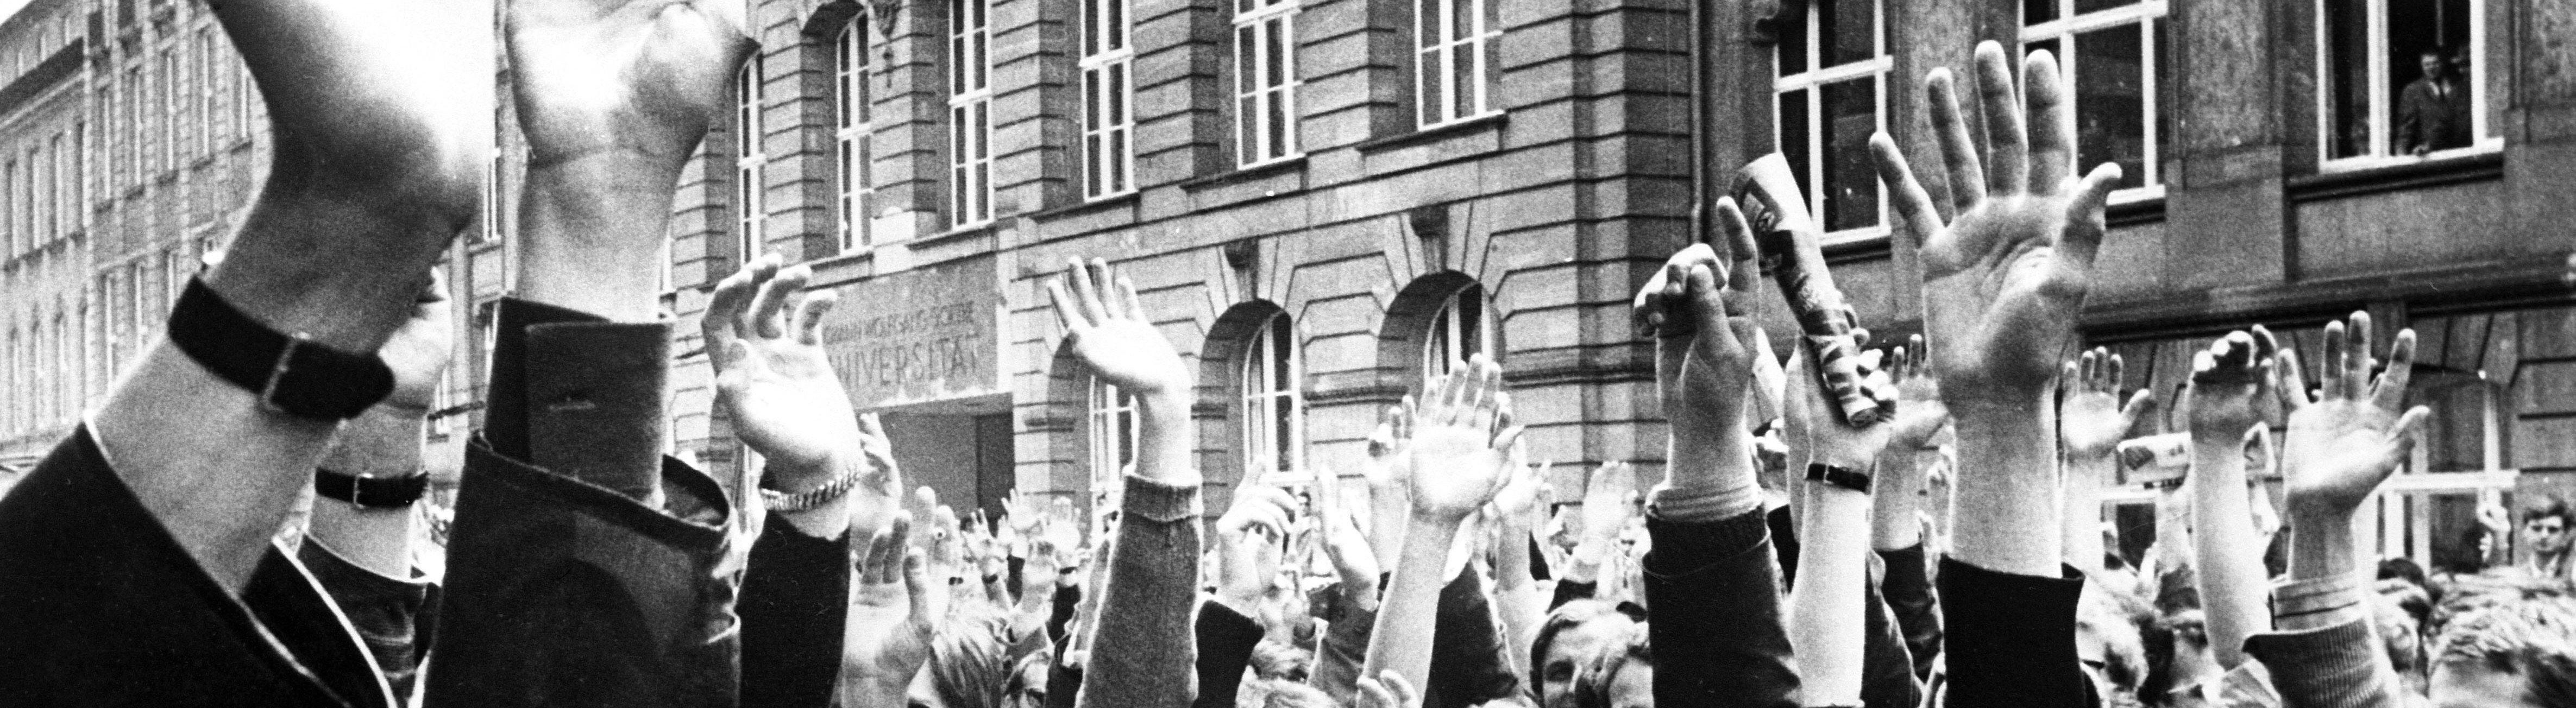 Studentenunruhen Frankfurt